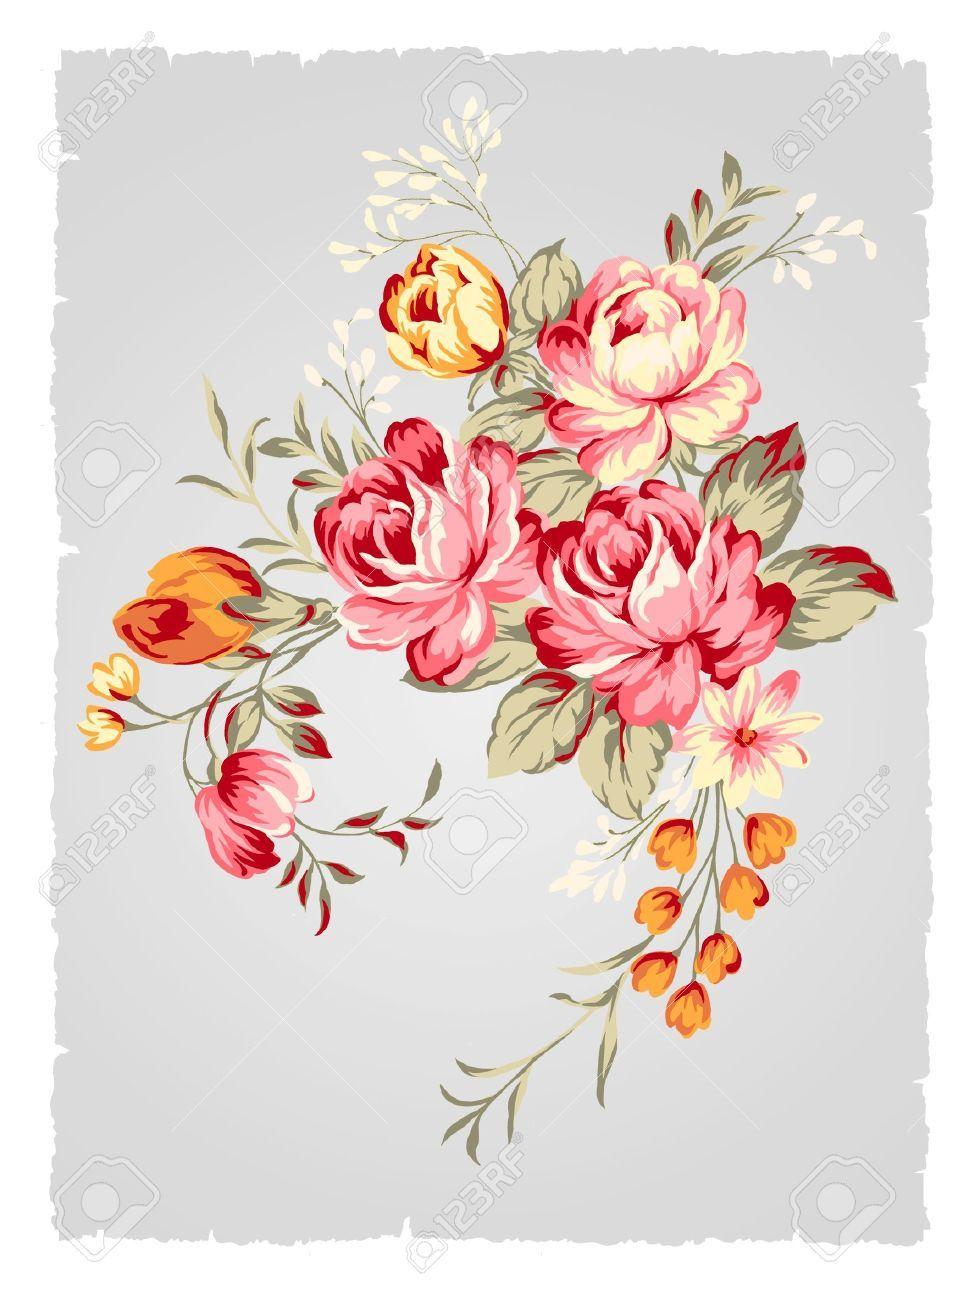 Simple Flower Designs For Painting | www.pixshark.com ...